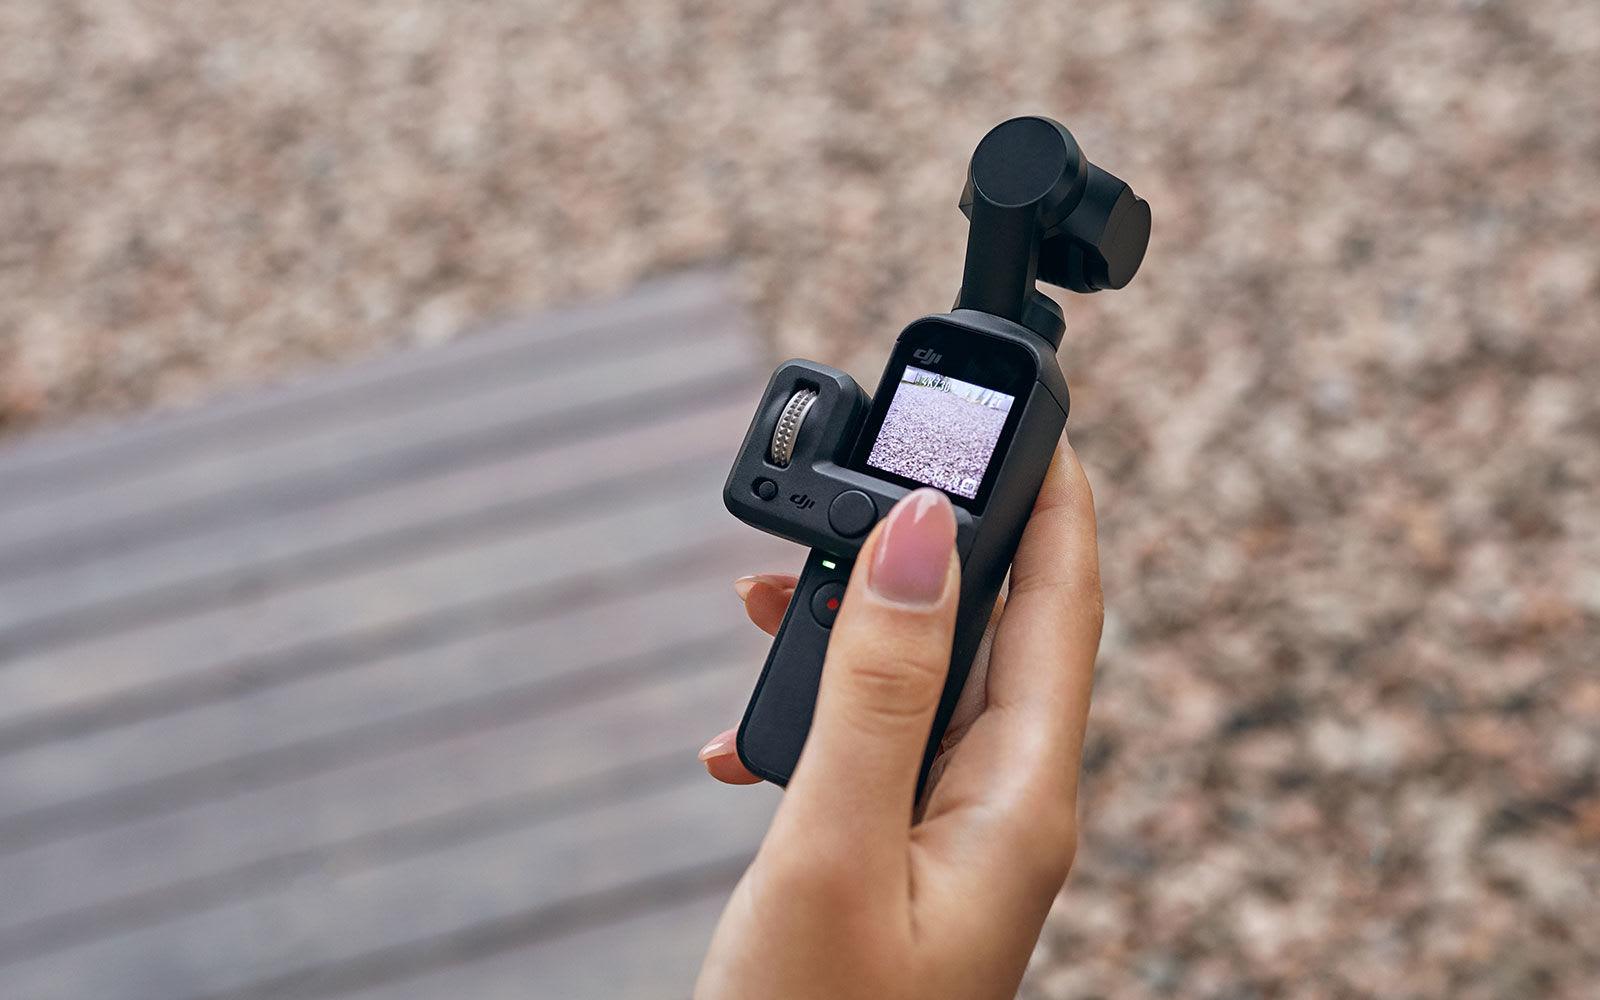 DJI 想靠 Osmo Pocket 進一步蠶食便攜雲台相機市場(更新:動手玩圖集)